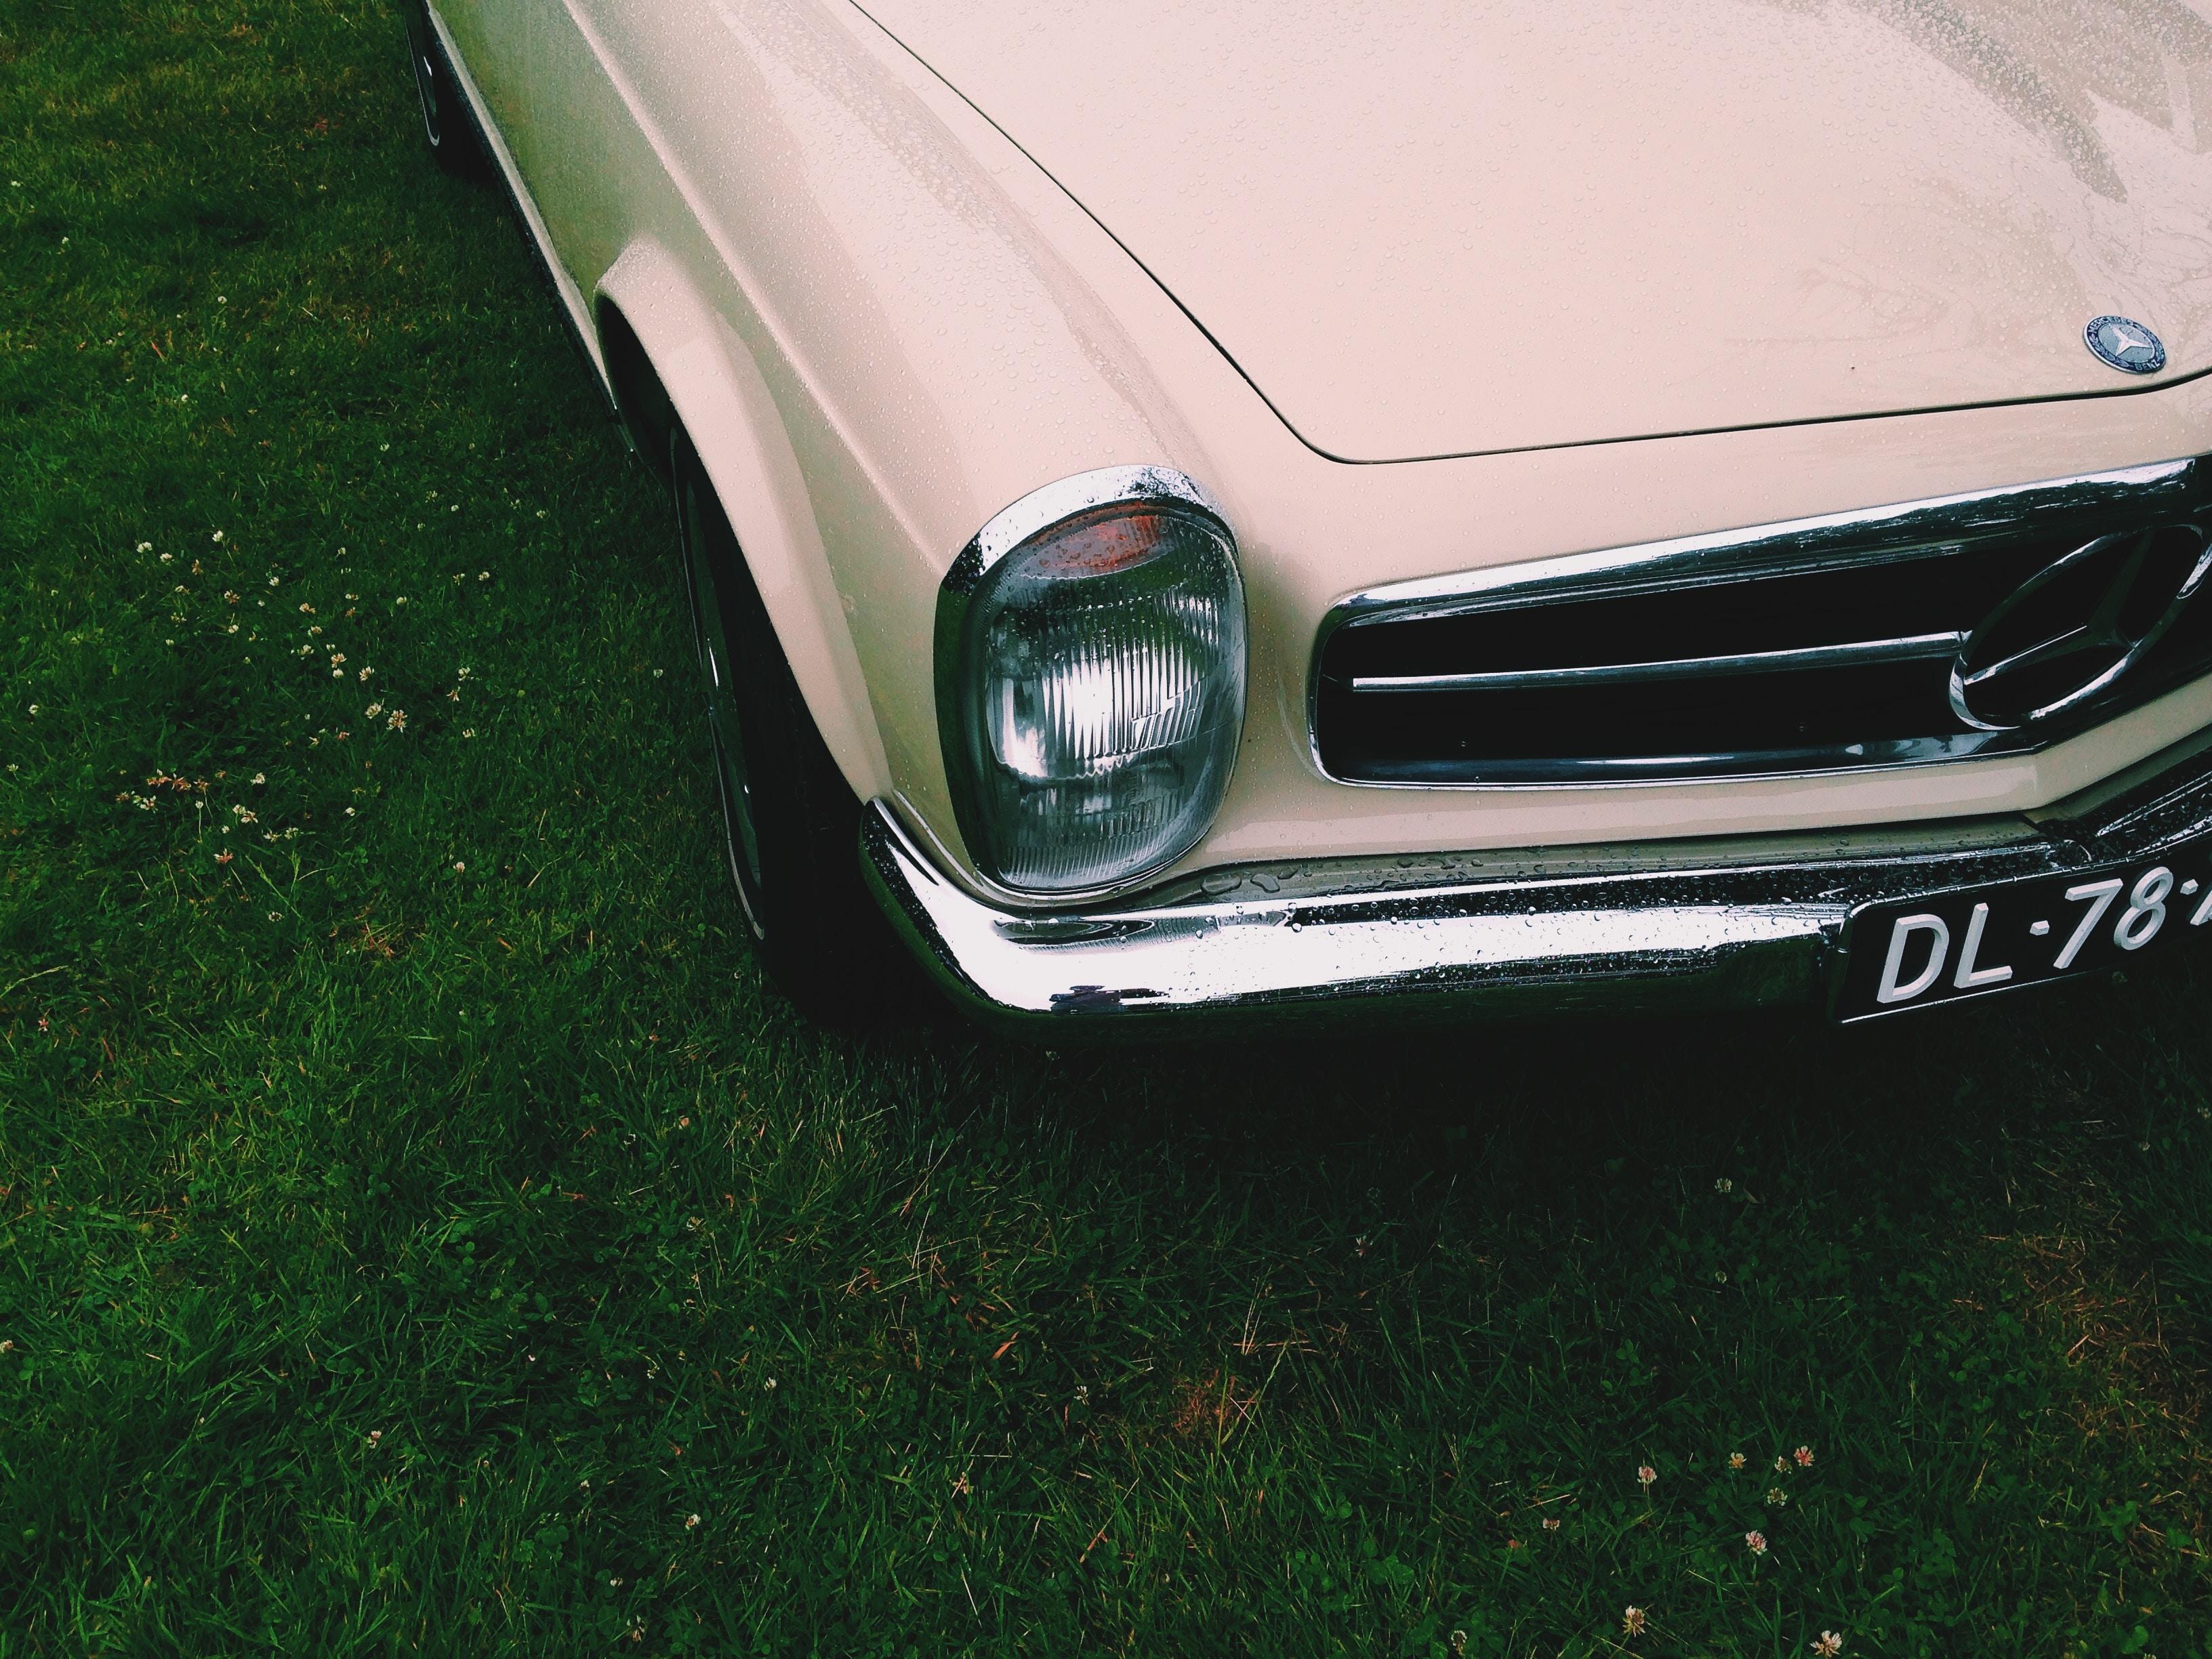 beige car on green grass field